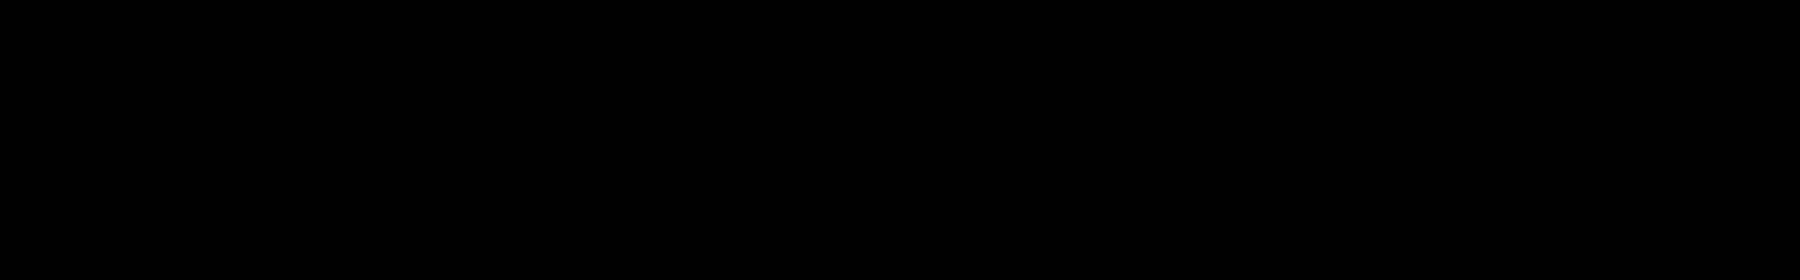 Selektor - Berlin Techno audio waveform